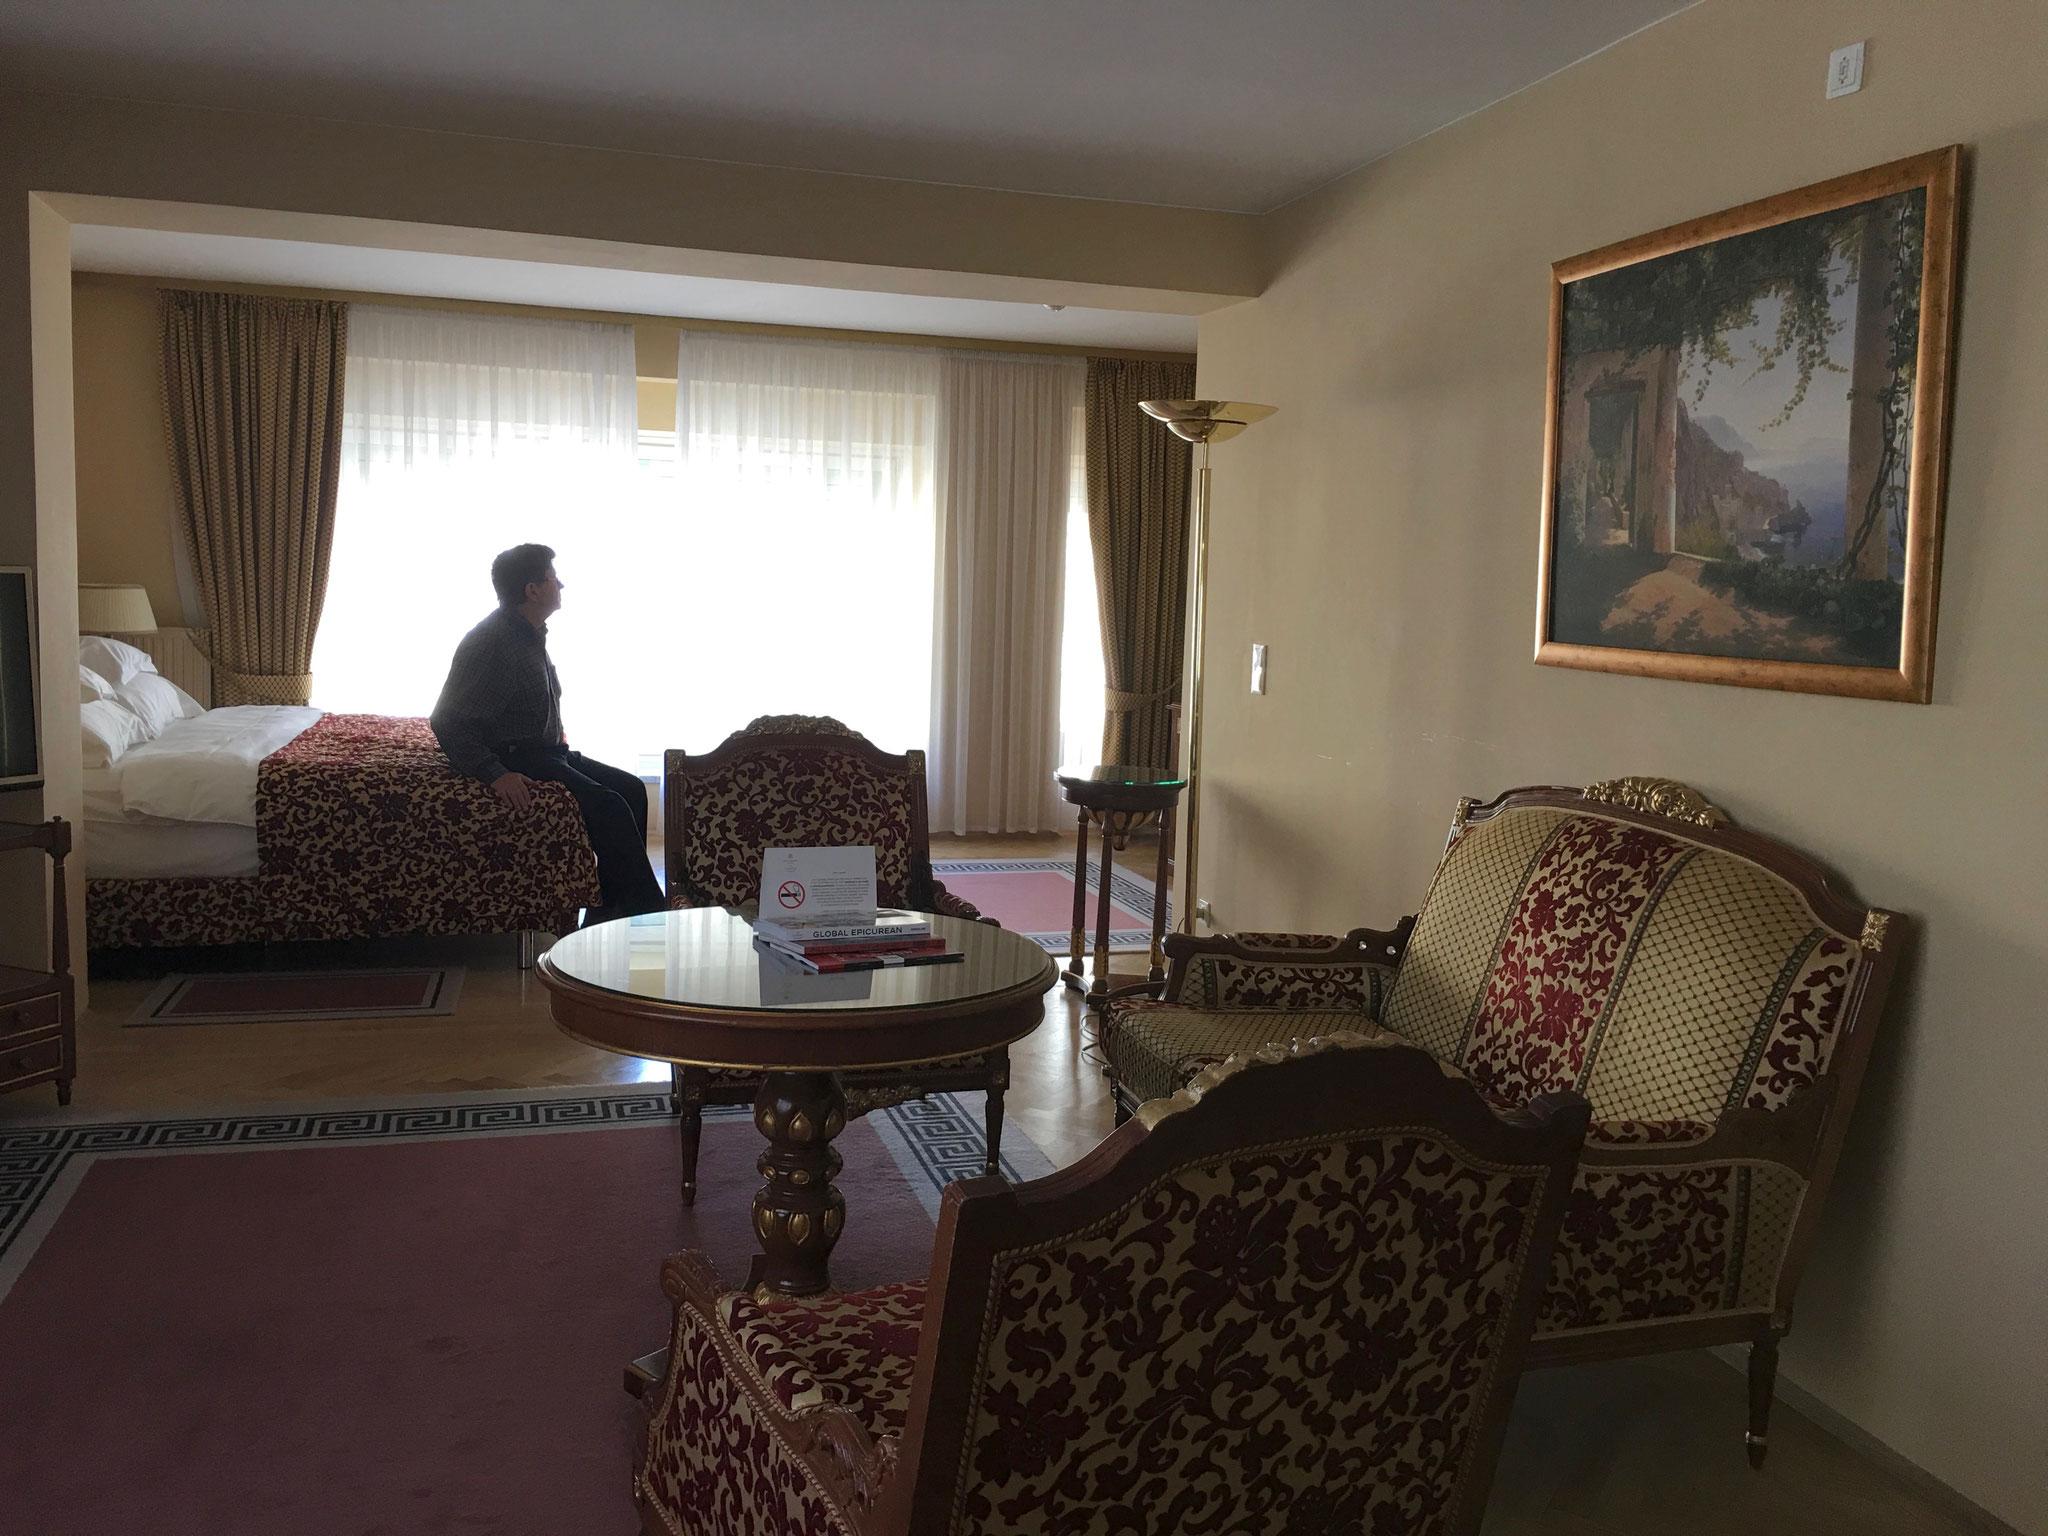 Lorraine & John's room